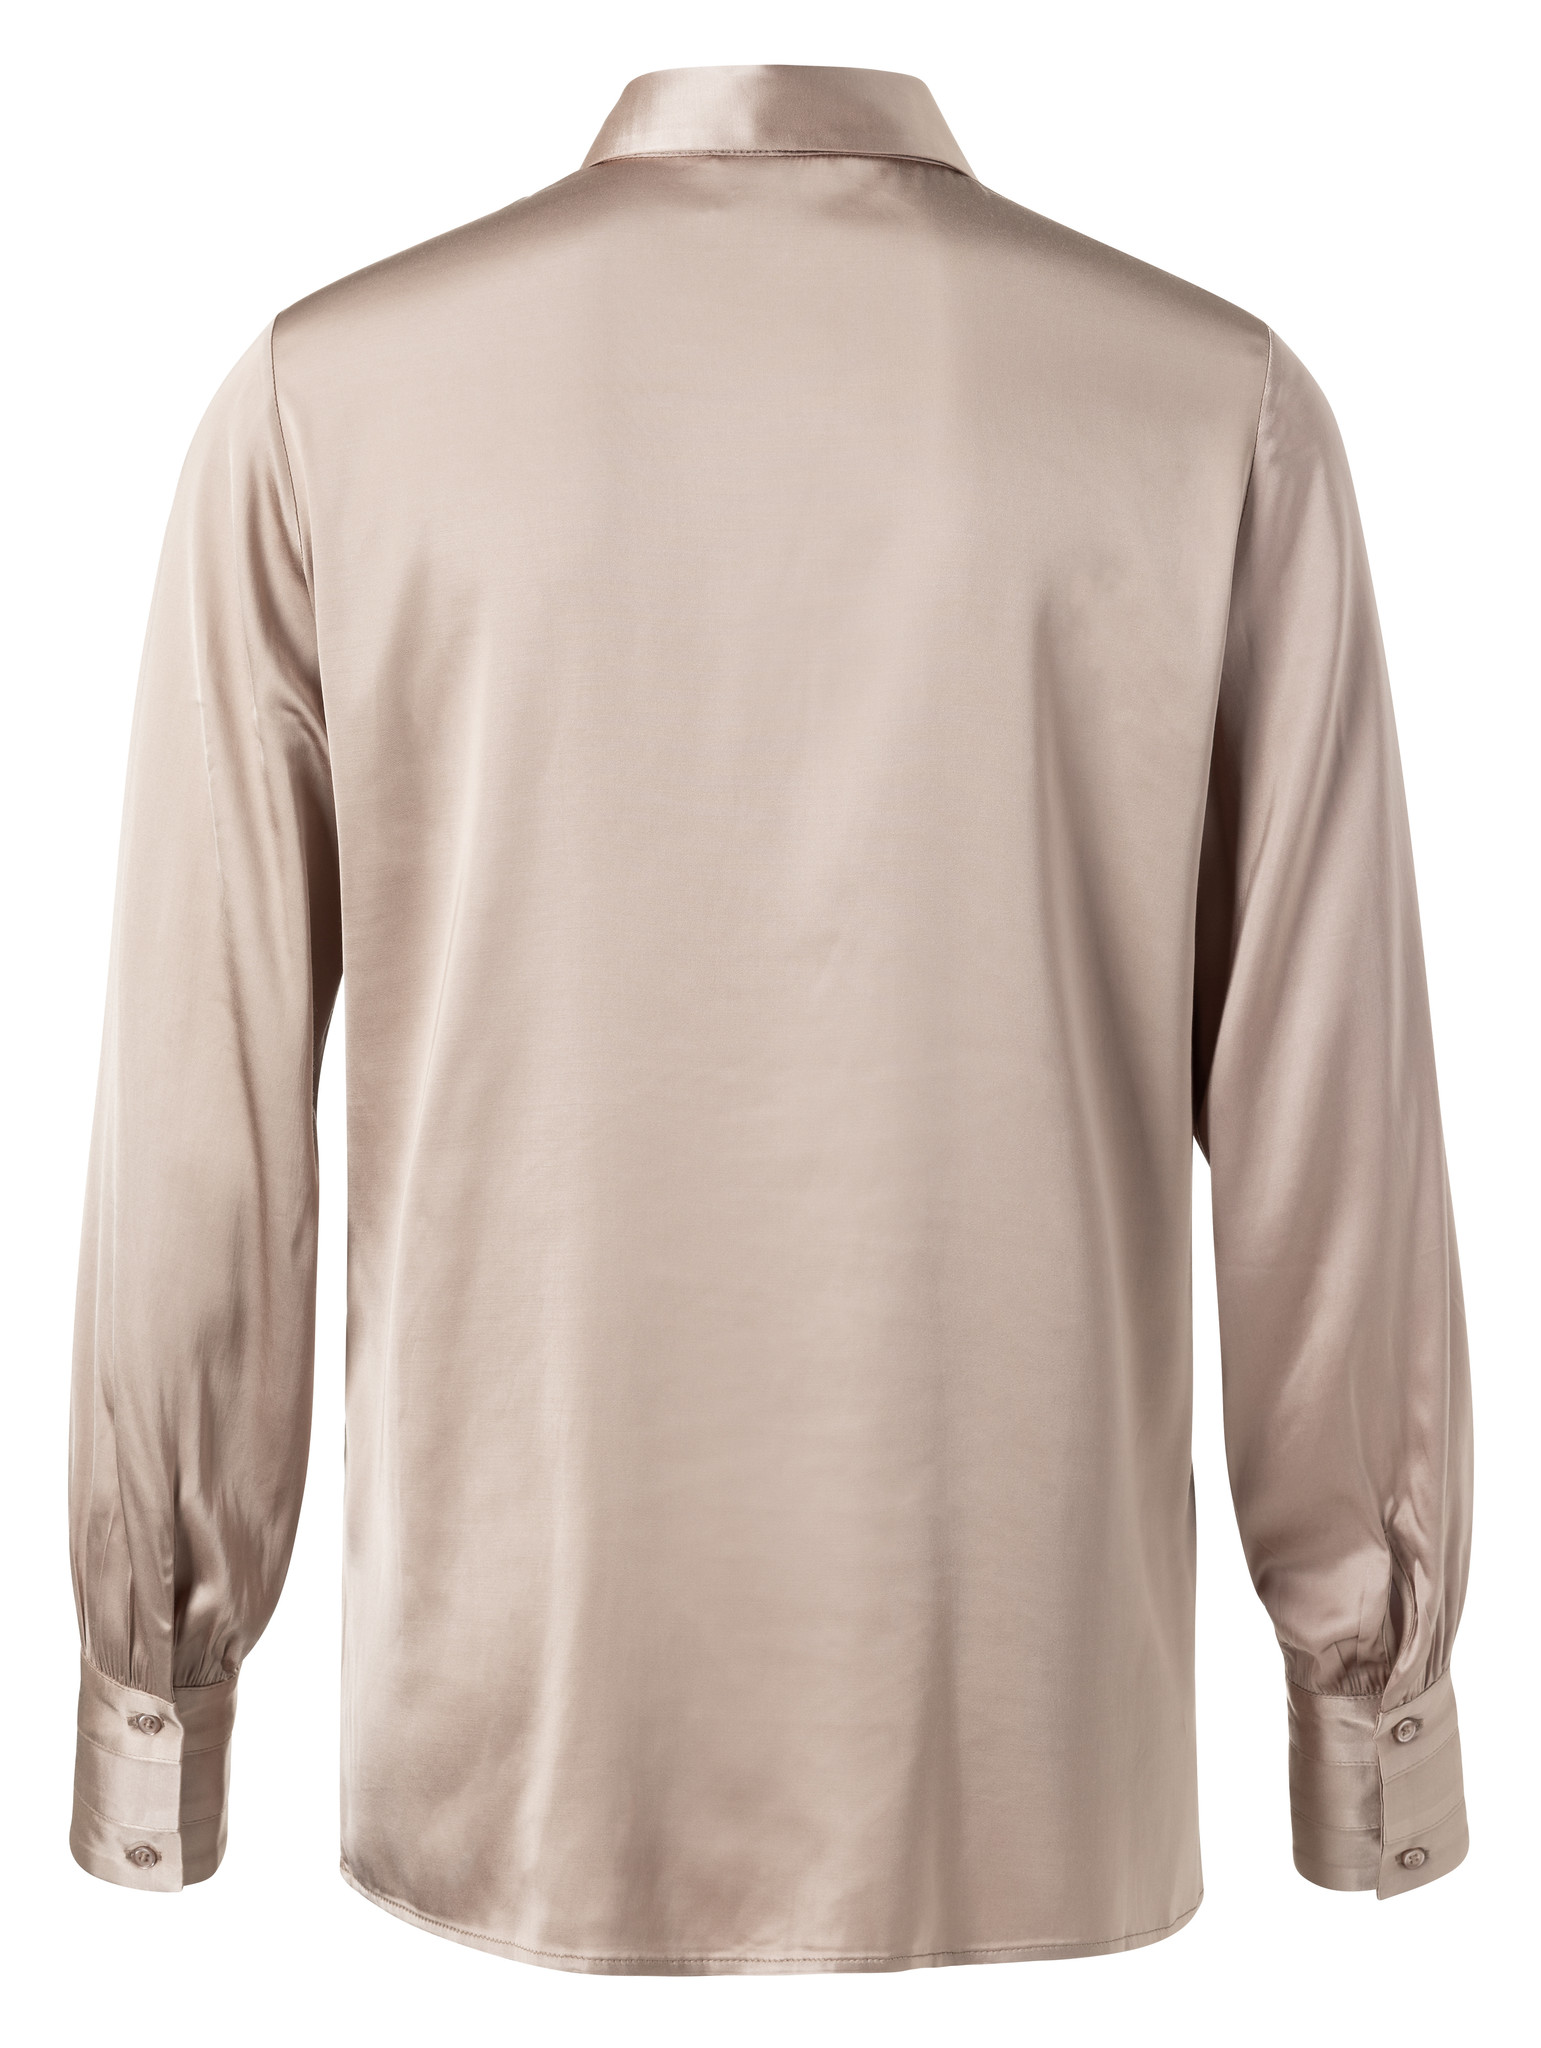 yaya Satin shirt detailed 1101195-111-3